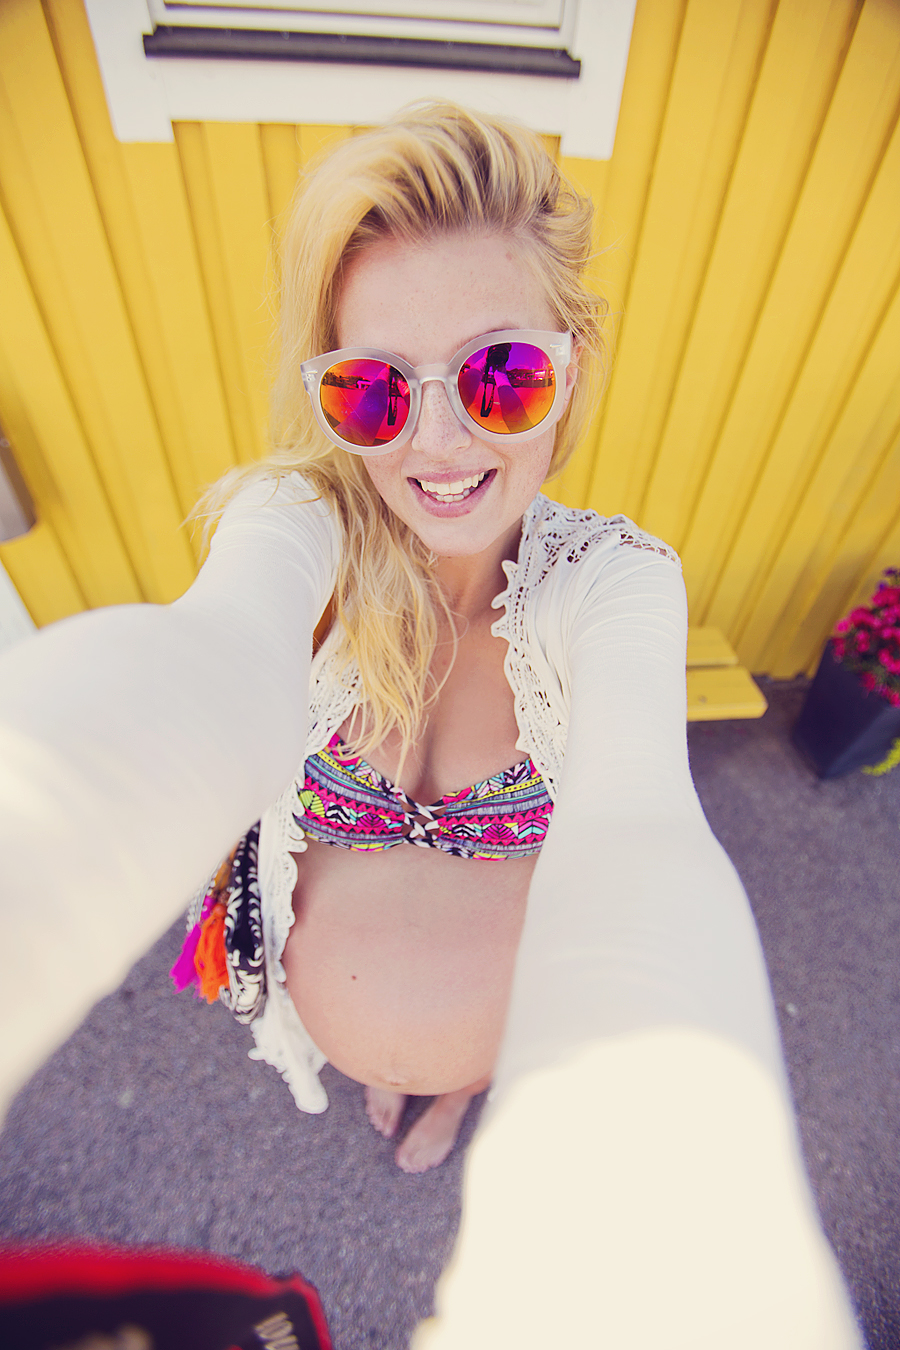 beachbump-gravid-blogg-2014-2015-graviditet-mage-strand-soling-foto-01